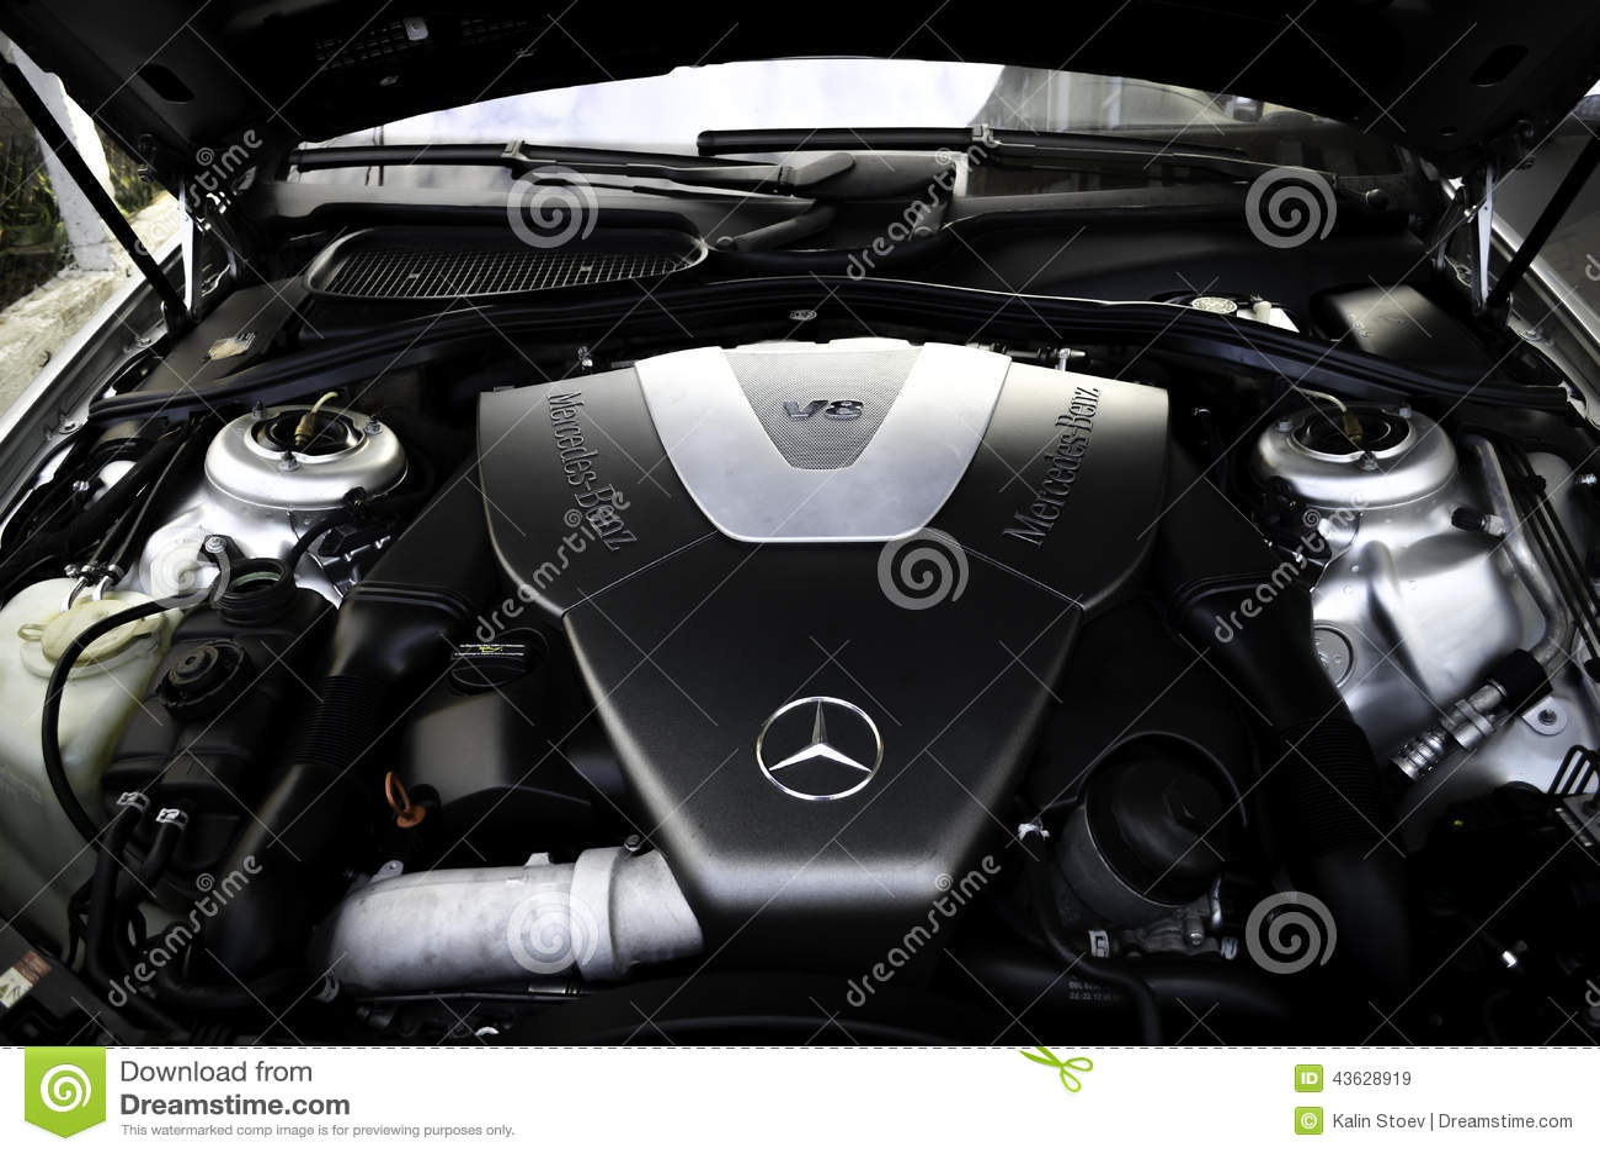 Mercedes Benz V8 Engine Editorial Stock Image Image